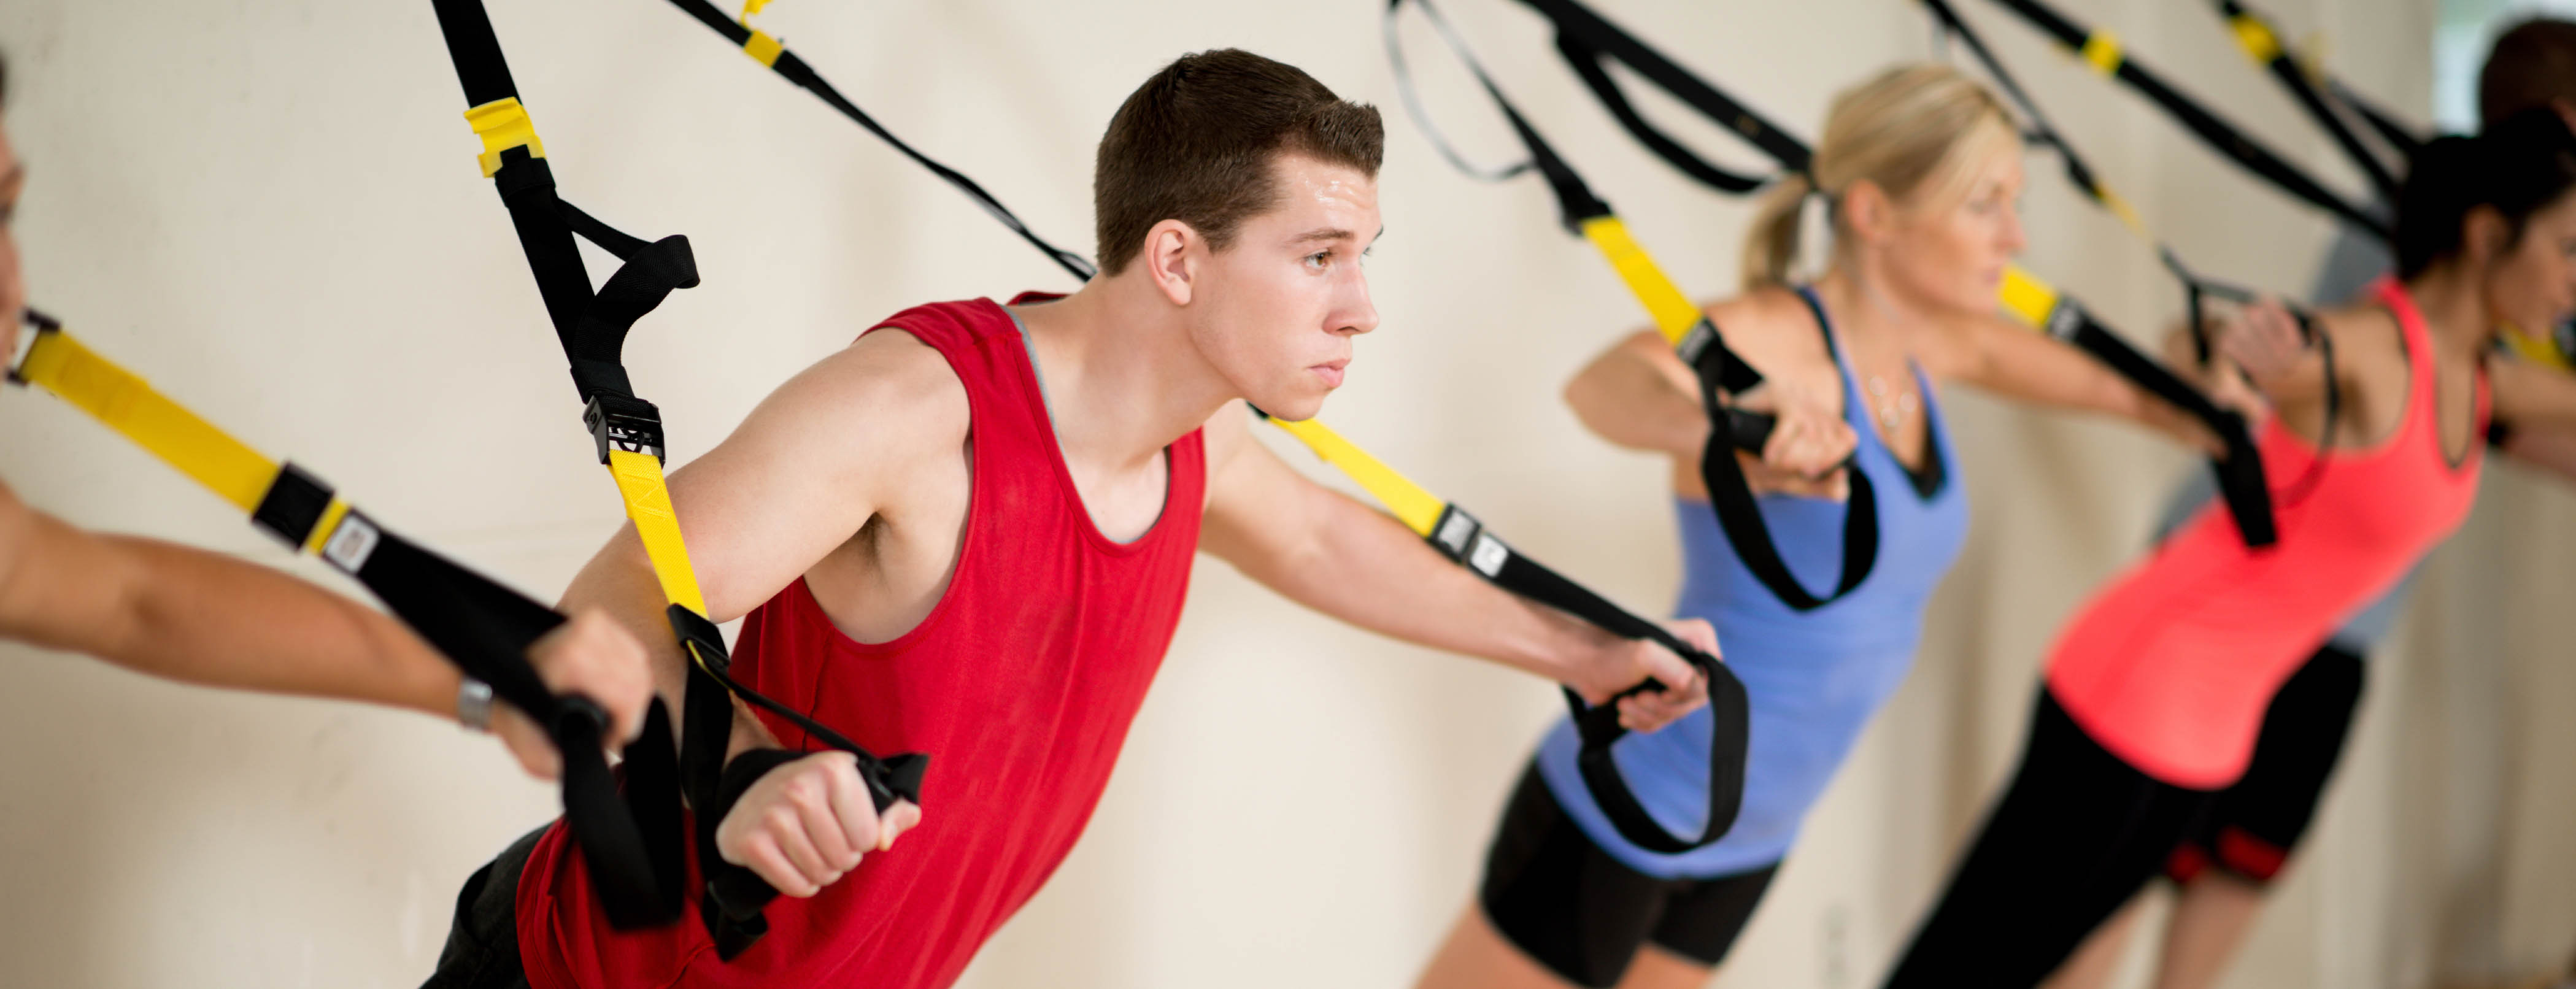 Gym אימון בחדר כושר